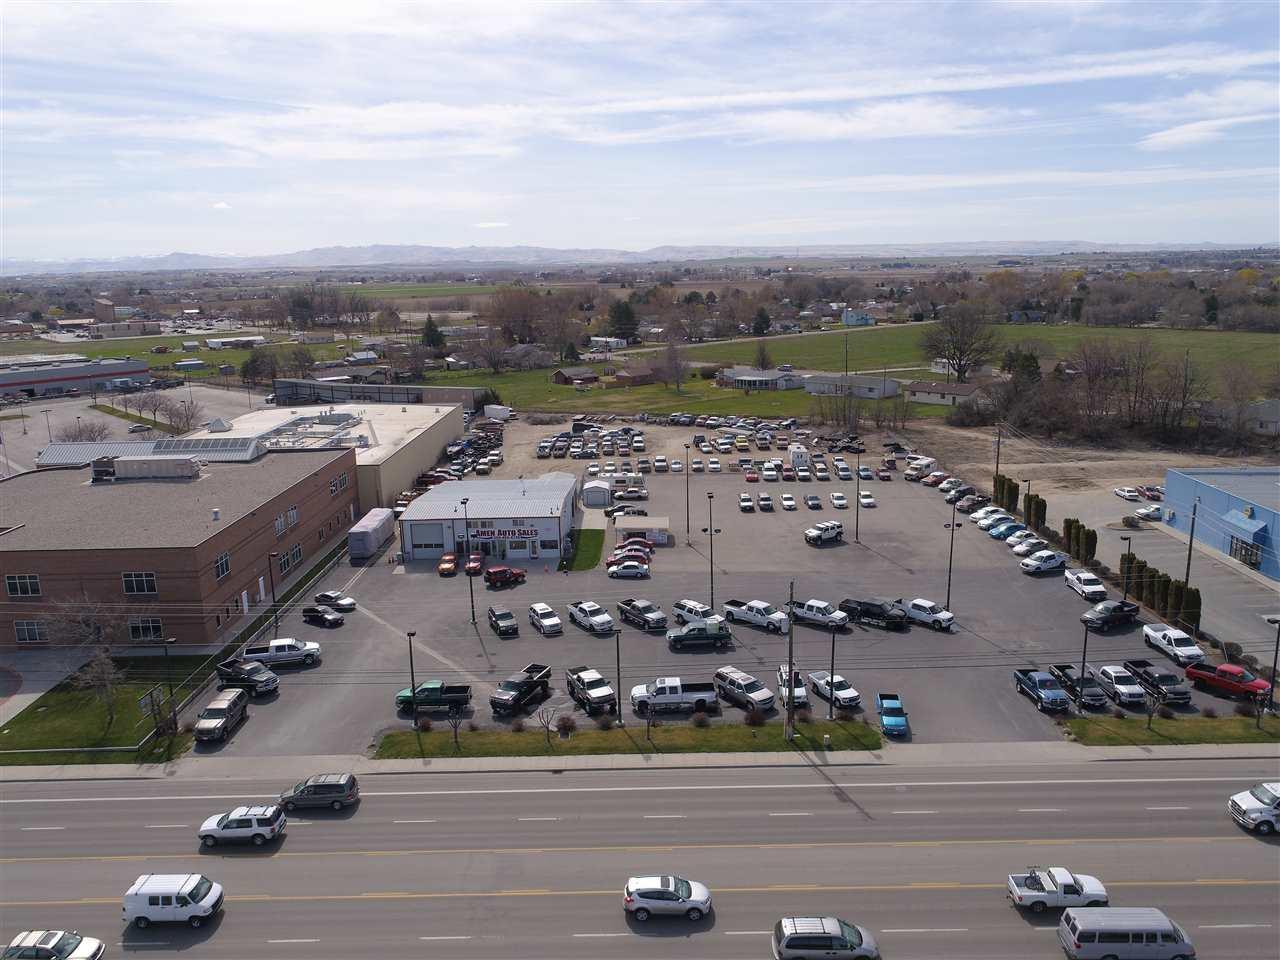 2417 Caldwell Blvd,Nampa,Idaho 83651,Business/Commercial,2417 Caldwell Blvd,98679248